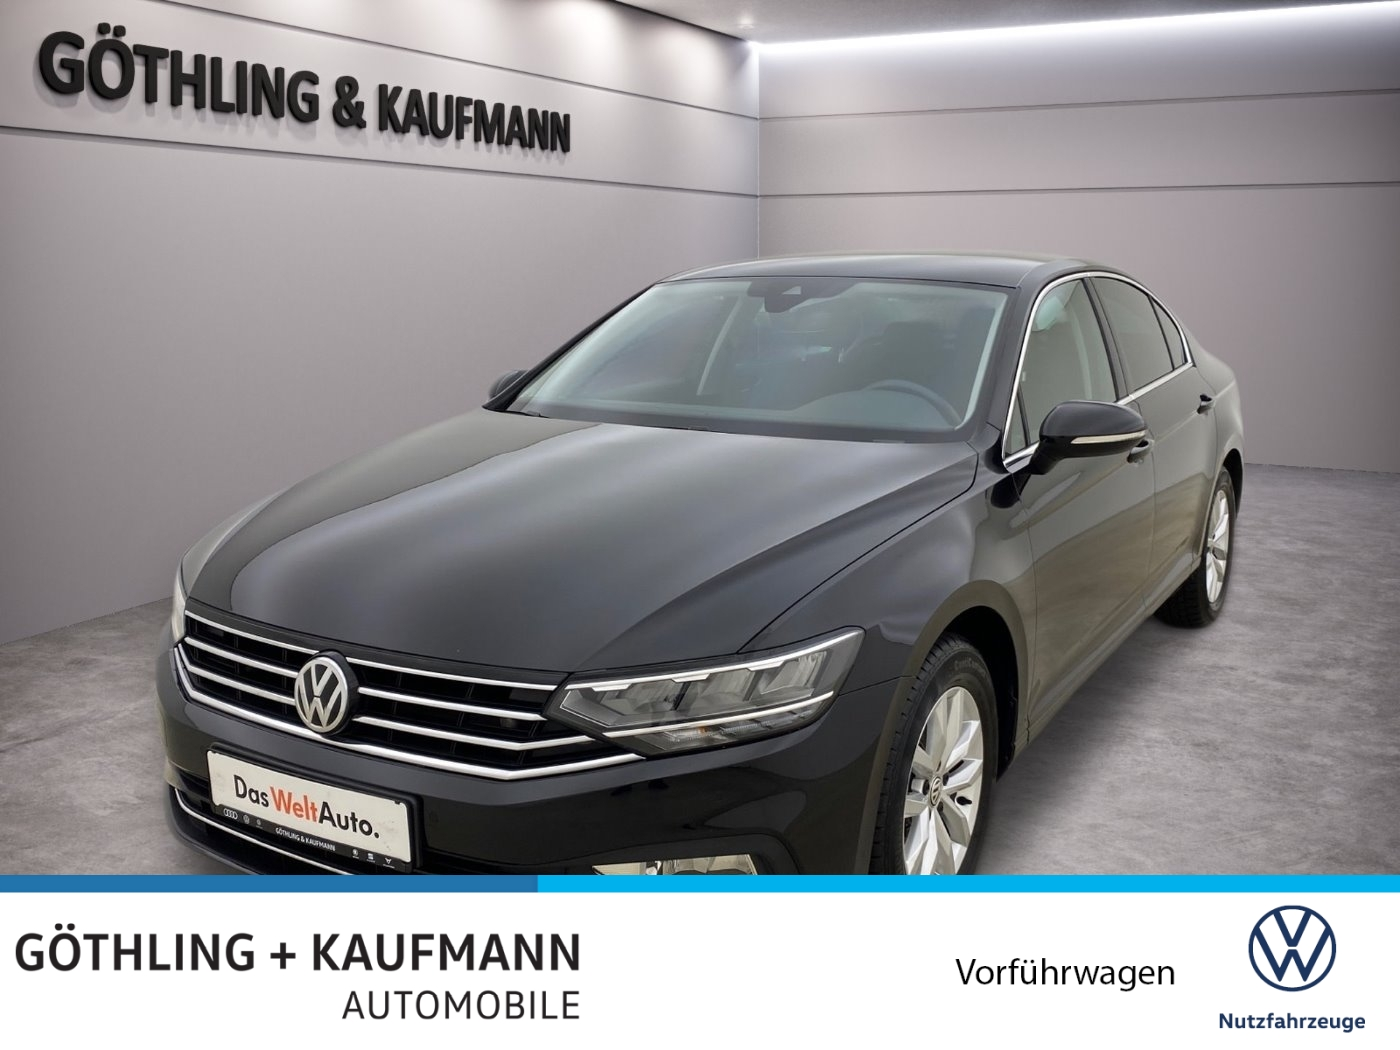 Volkswagen Passat 2.0 TDI Buissnes DSG 110kW*Kamera*ACC*LED, Jahr 2020, Diesel